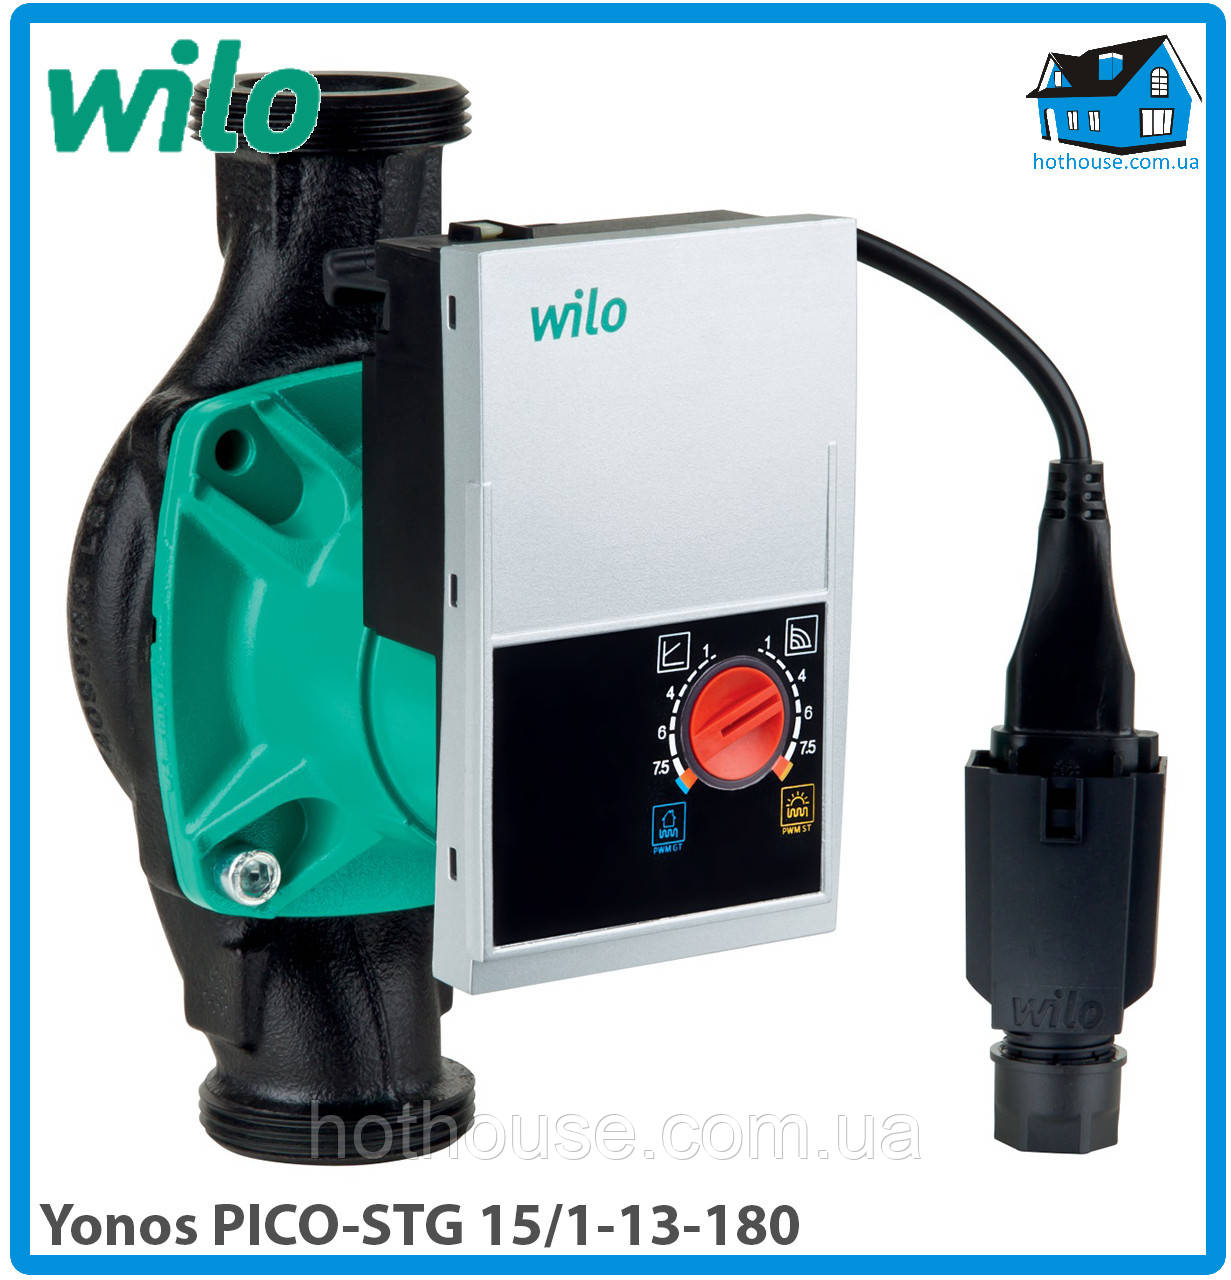 Насос циркуляционный Wilo Yonos PICO-STG 15/1-13-180 (оригинал)